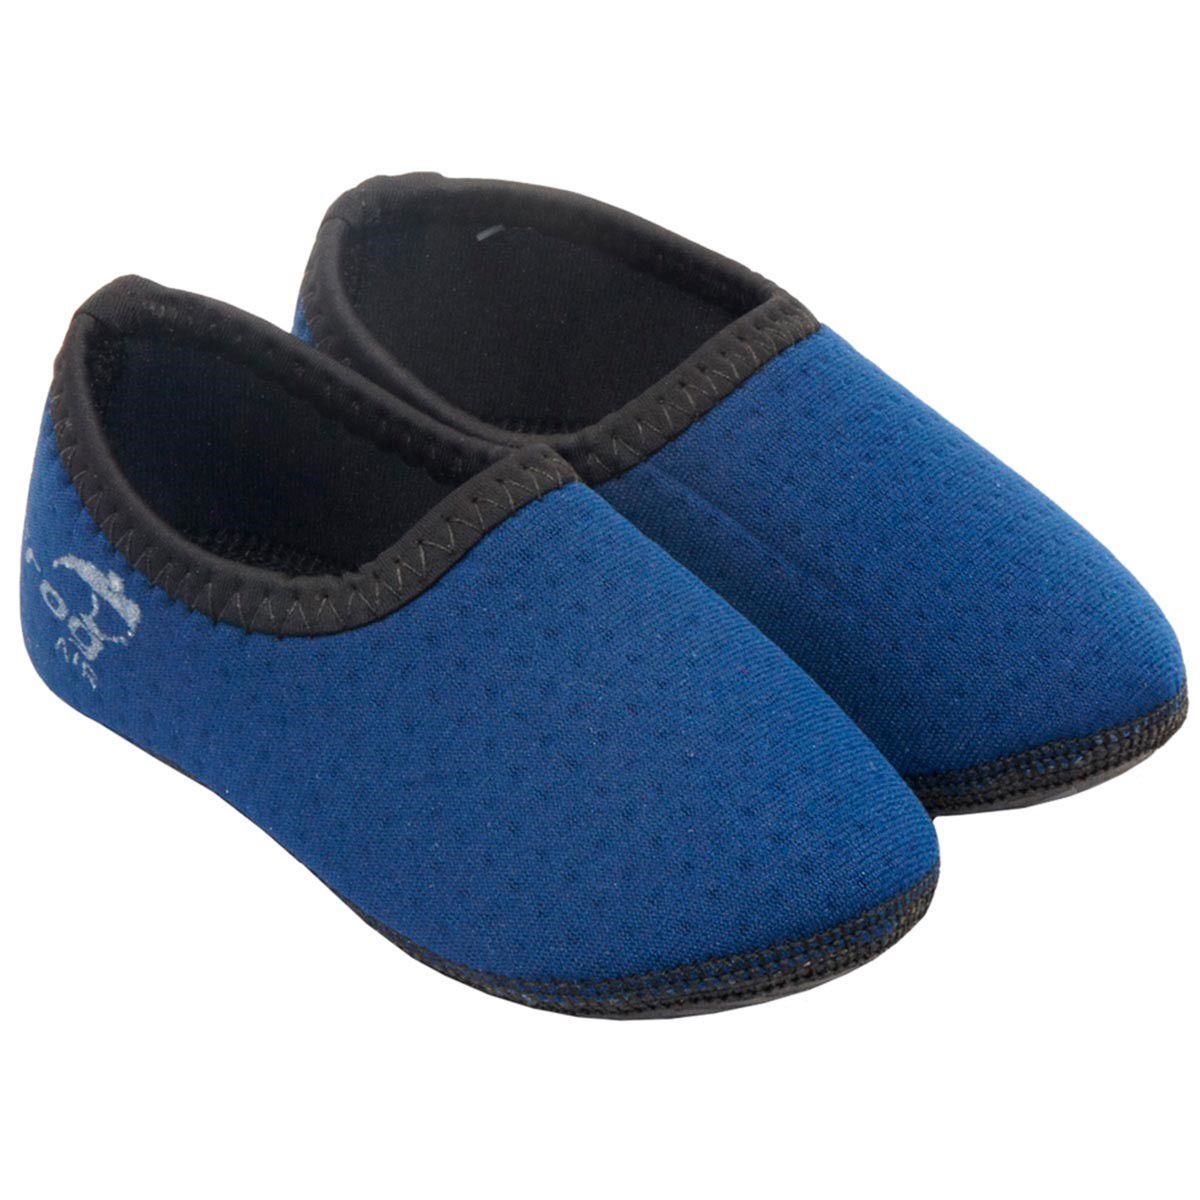 Sapato de Neoprene Adulto Fit Azul Marinho Ufrog